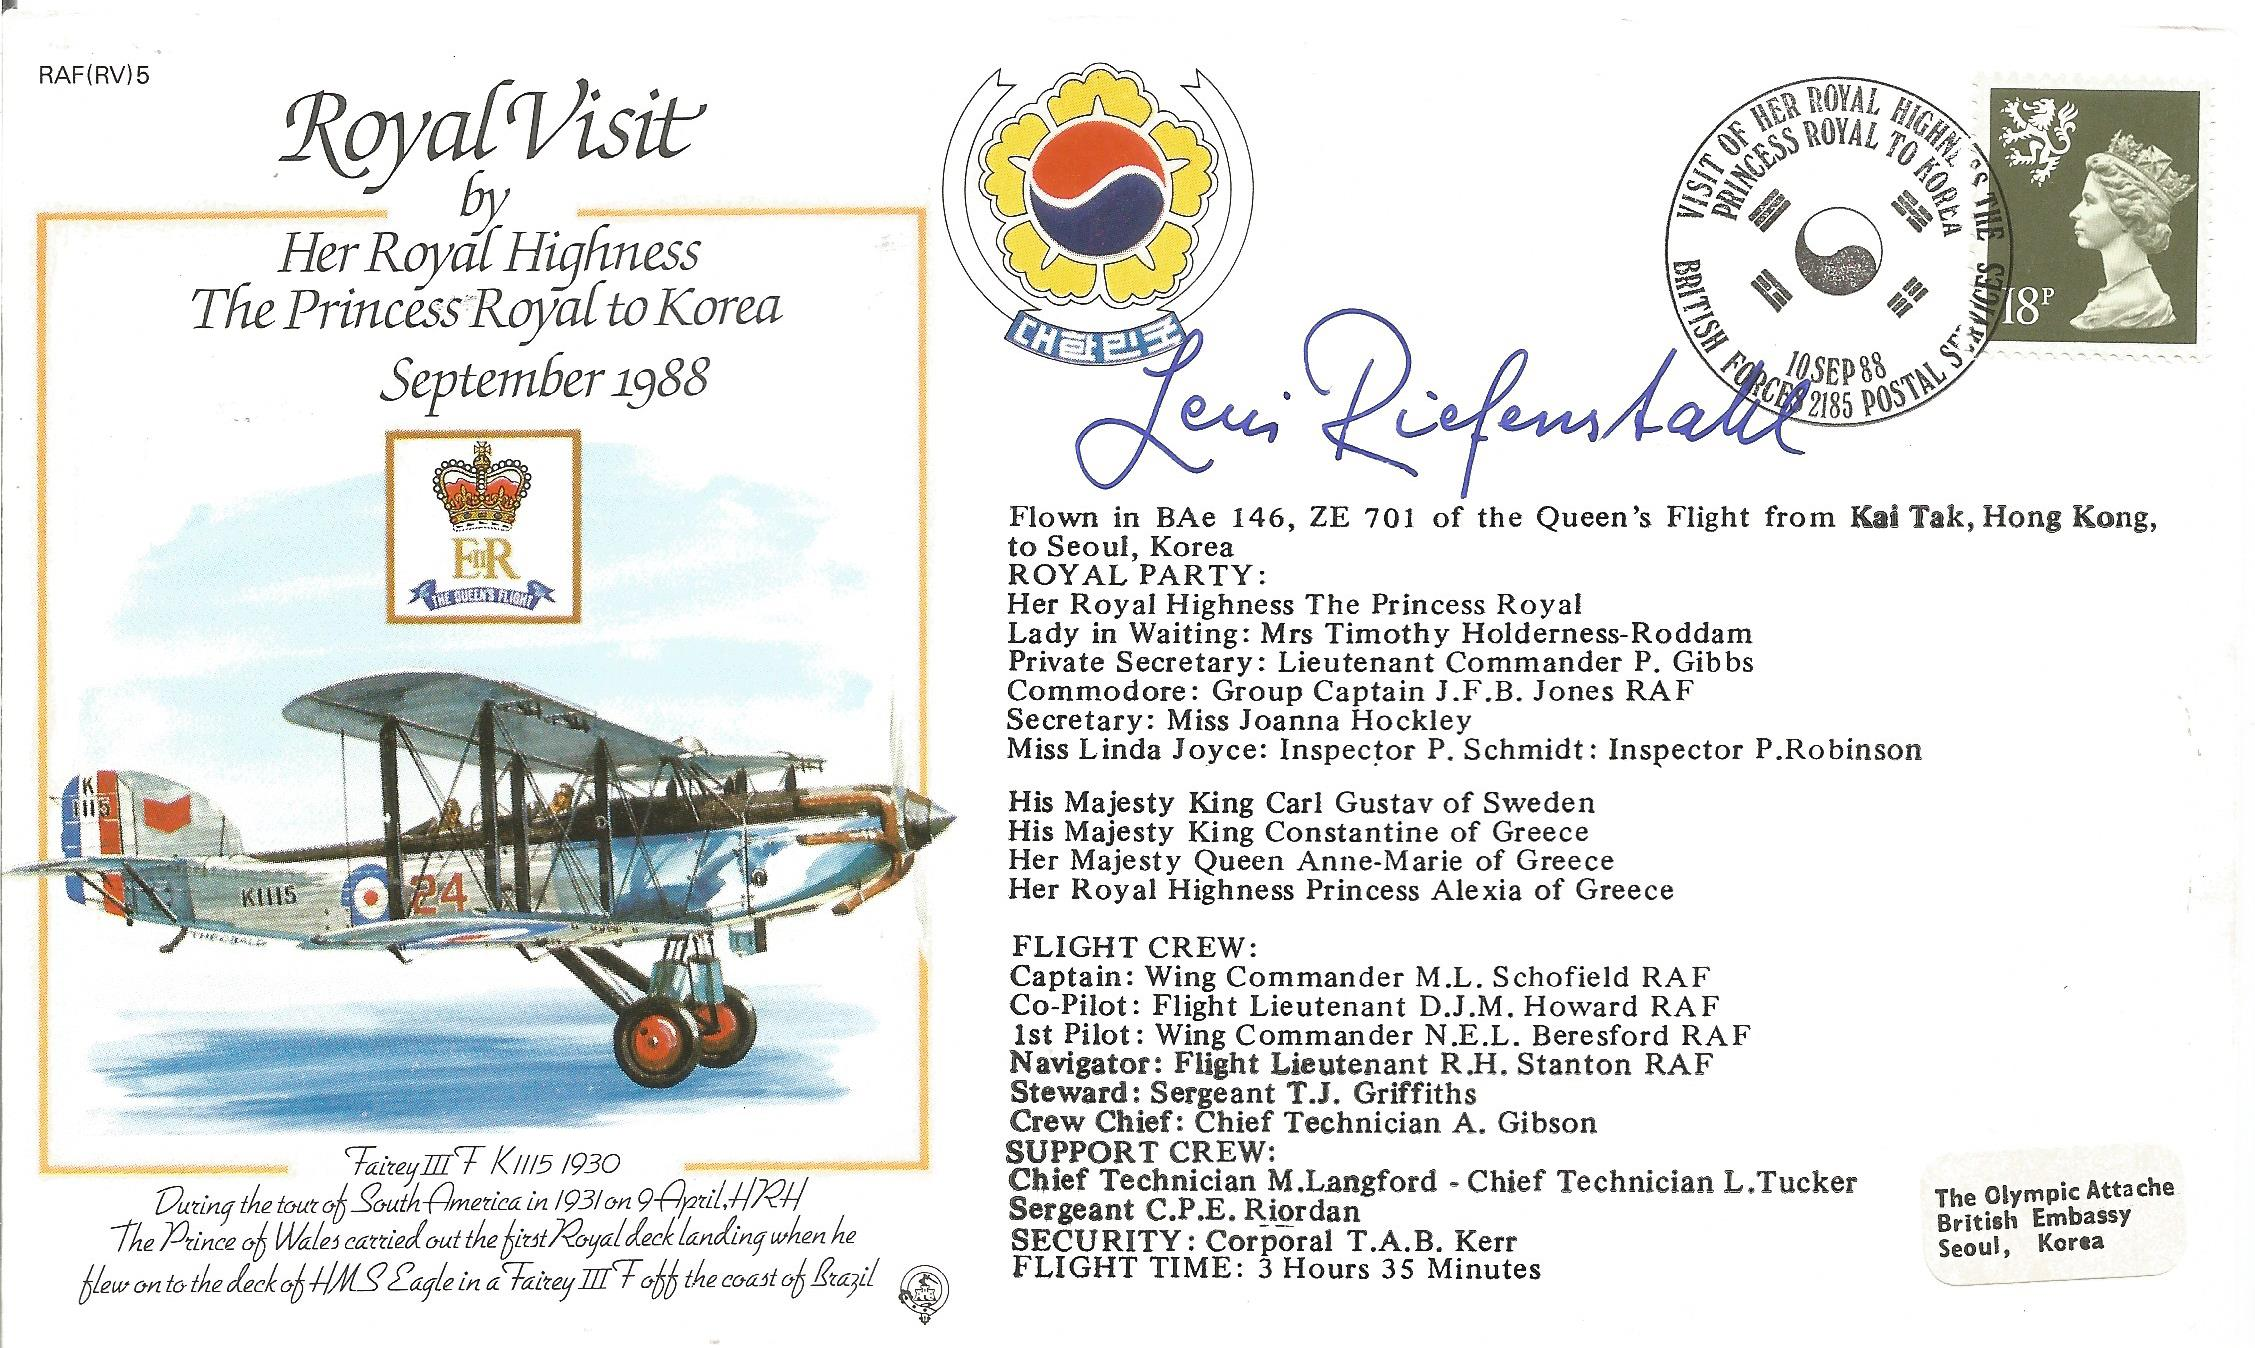 Leni Riefenstahl signed Royal Visit by Her Royal Highness The Princess Royal to Korea September 1988